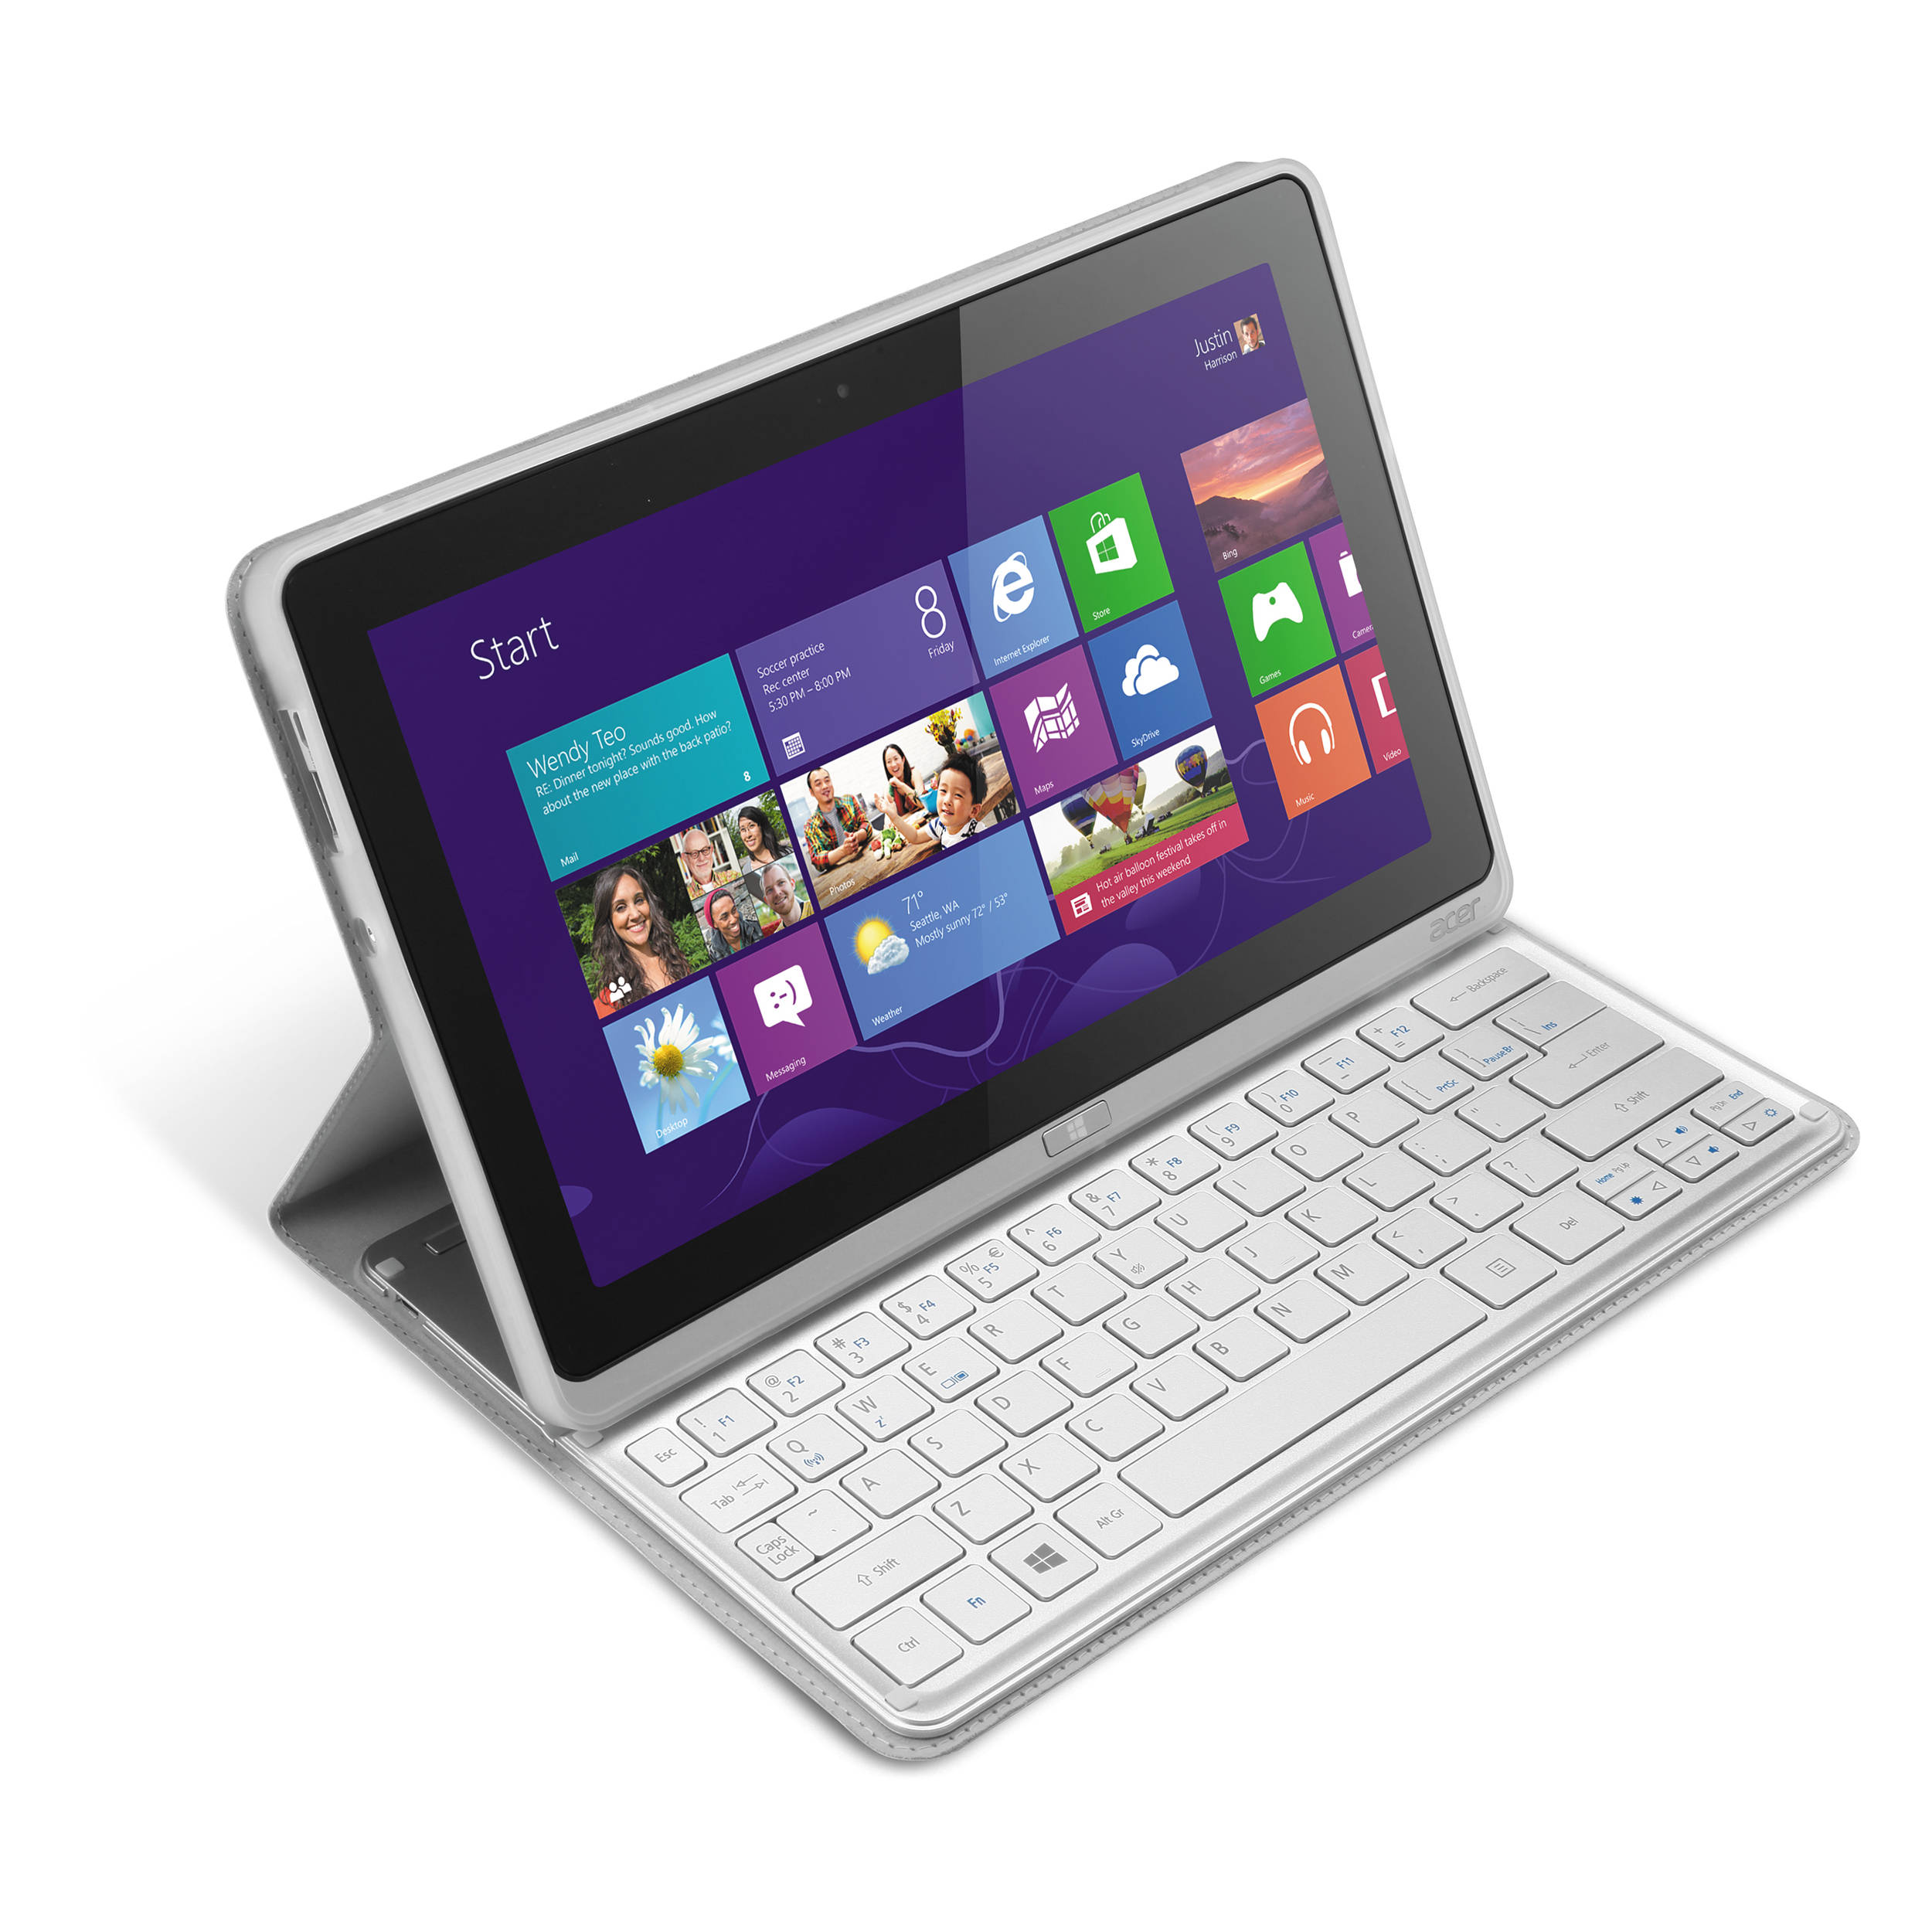 acer 128gb iconia w700 6499 11 6 tablet nt b h. Black Bedroom Furniture Sets. Home Design Ideas